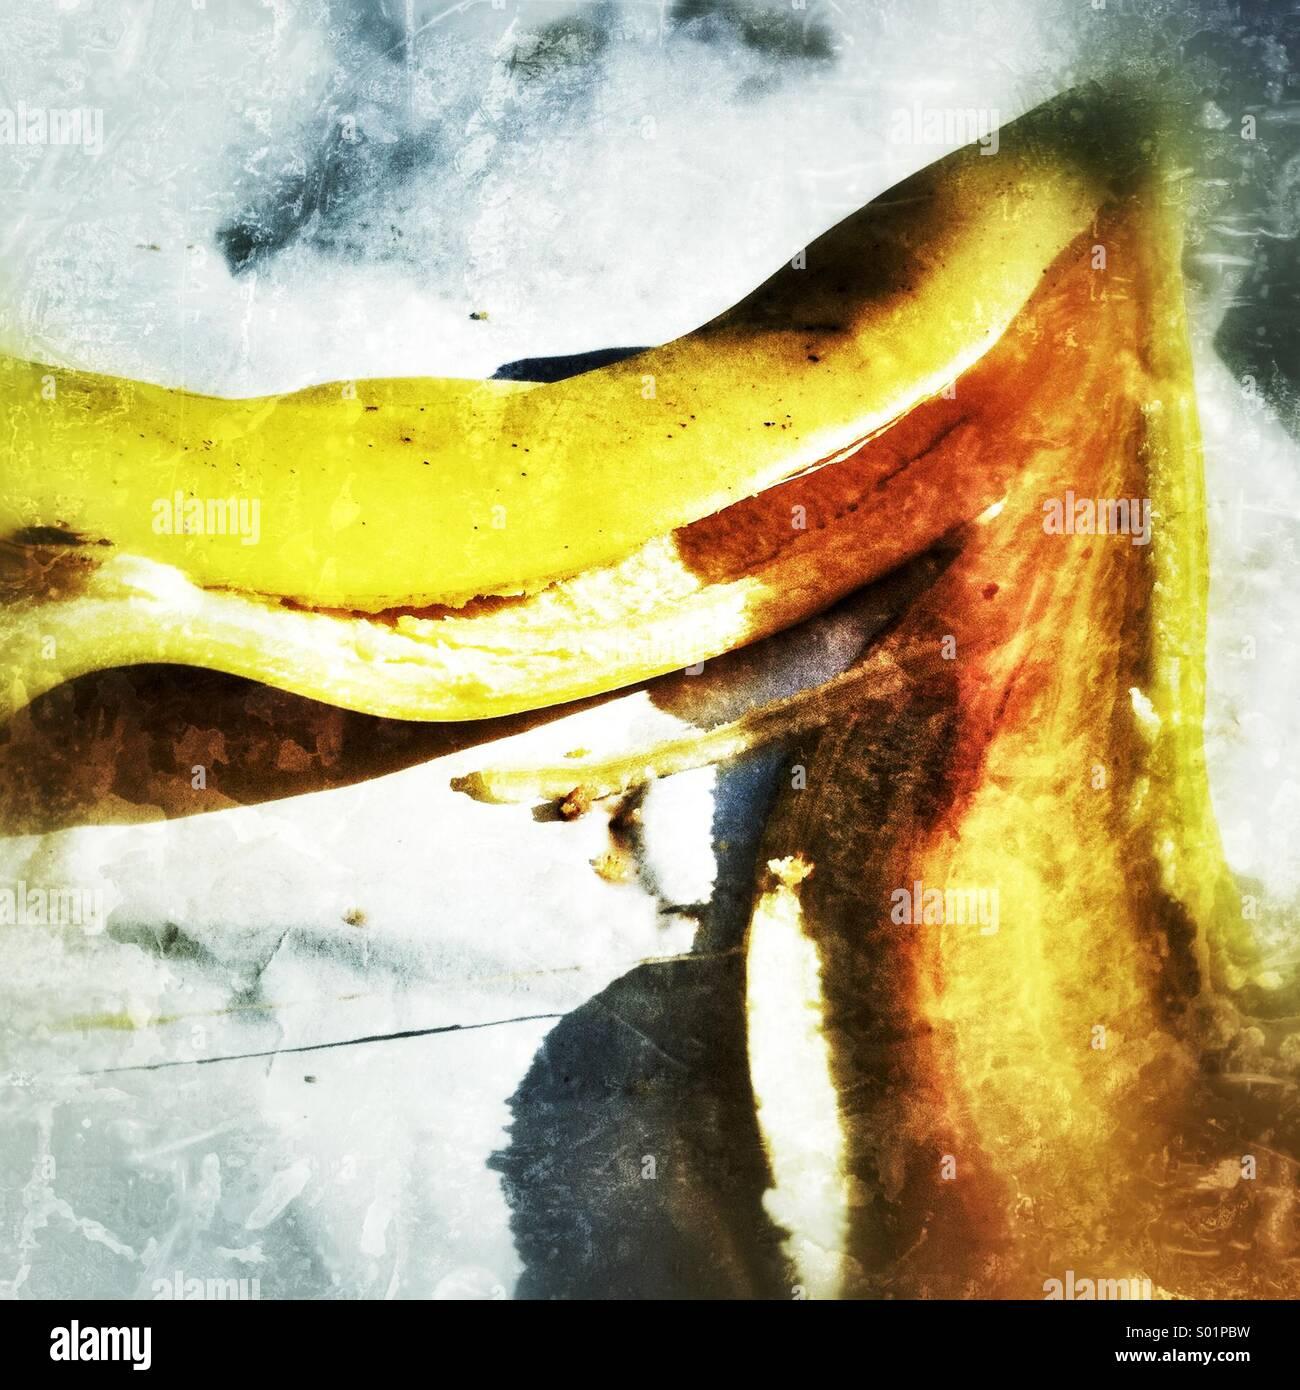 Banana Skin - Stock Image